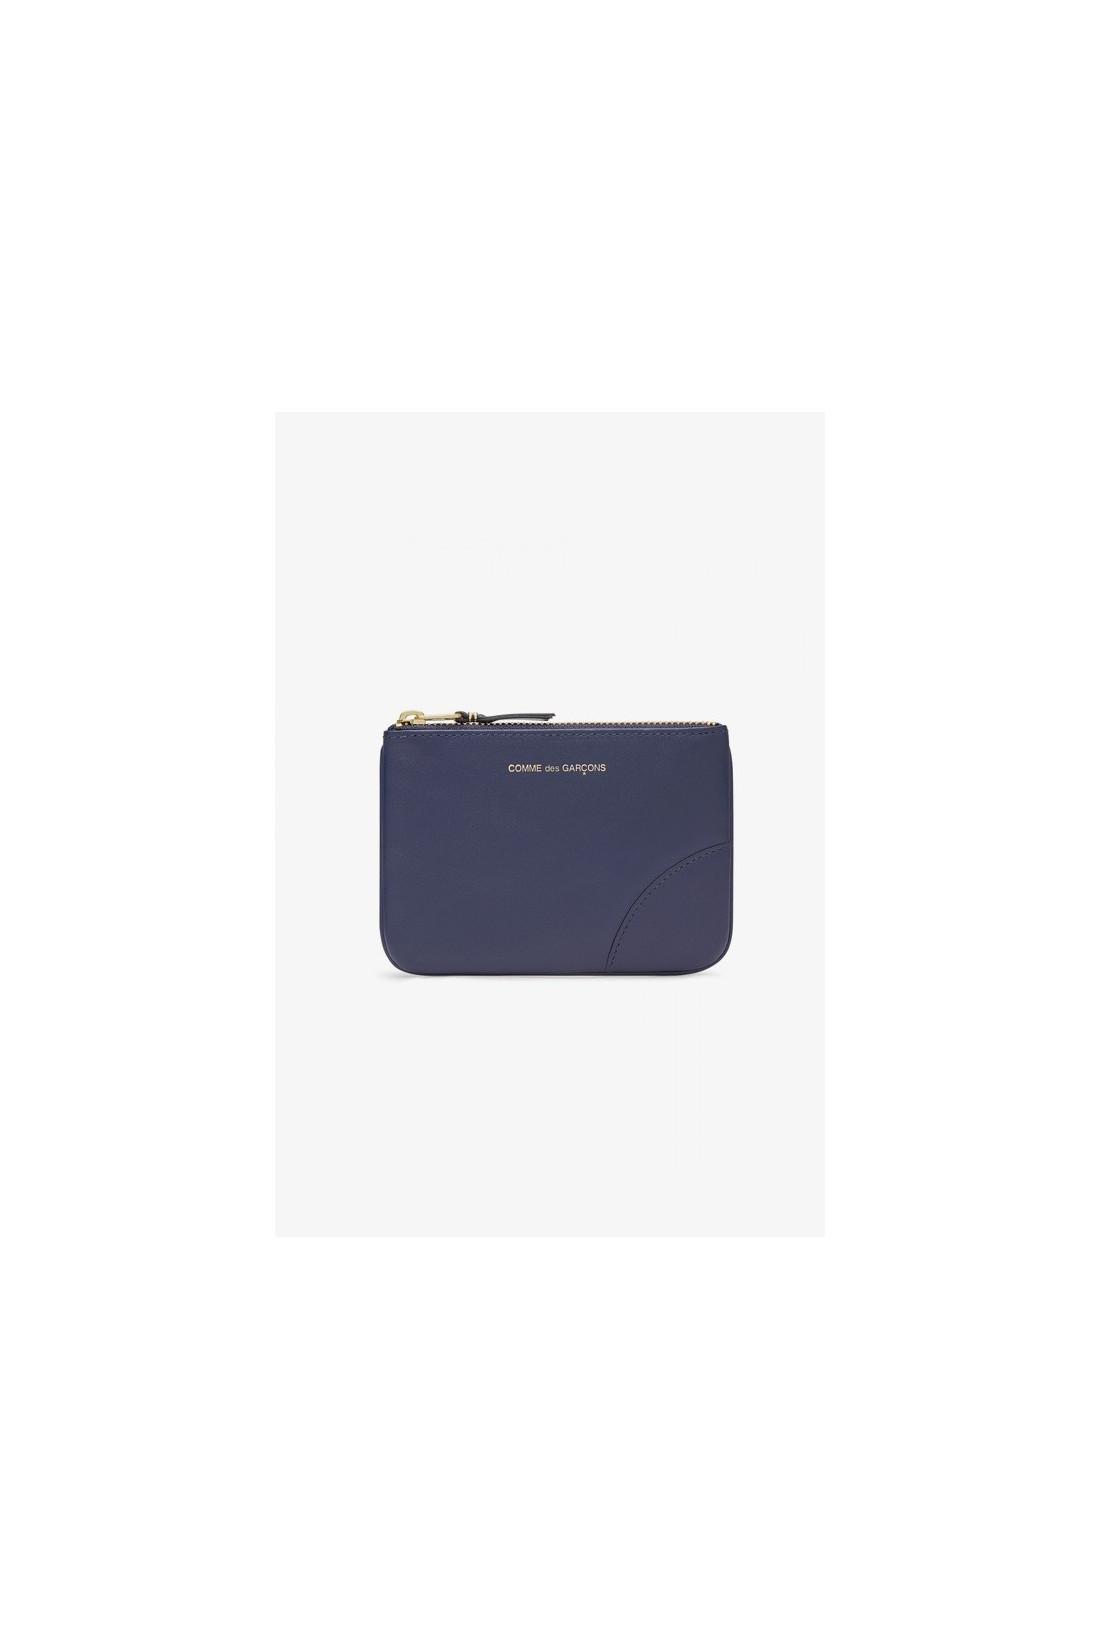 COMME DES GARÇONS WALLETS / Cdg leather wallet classic Navy